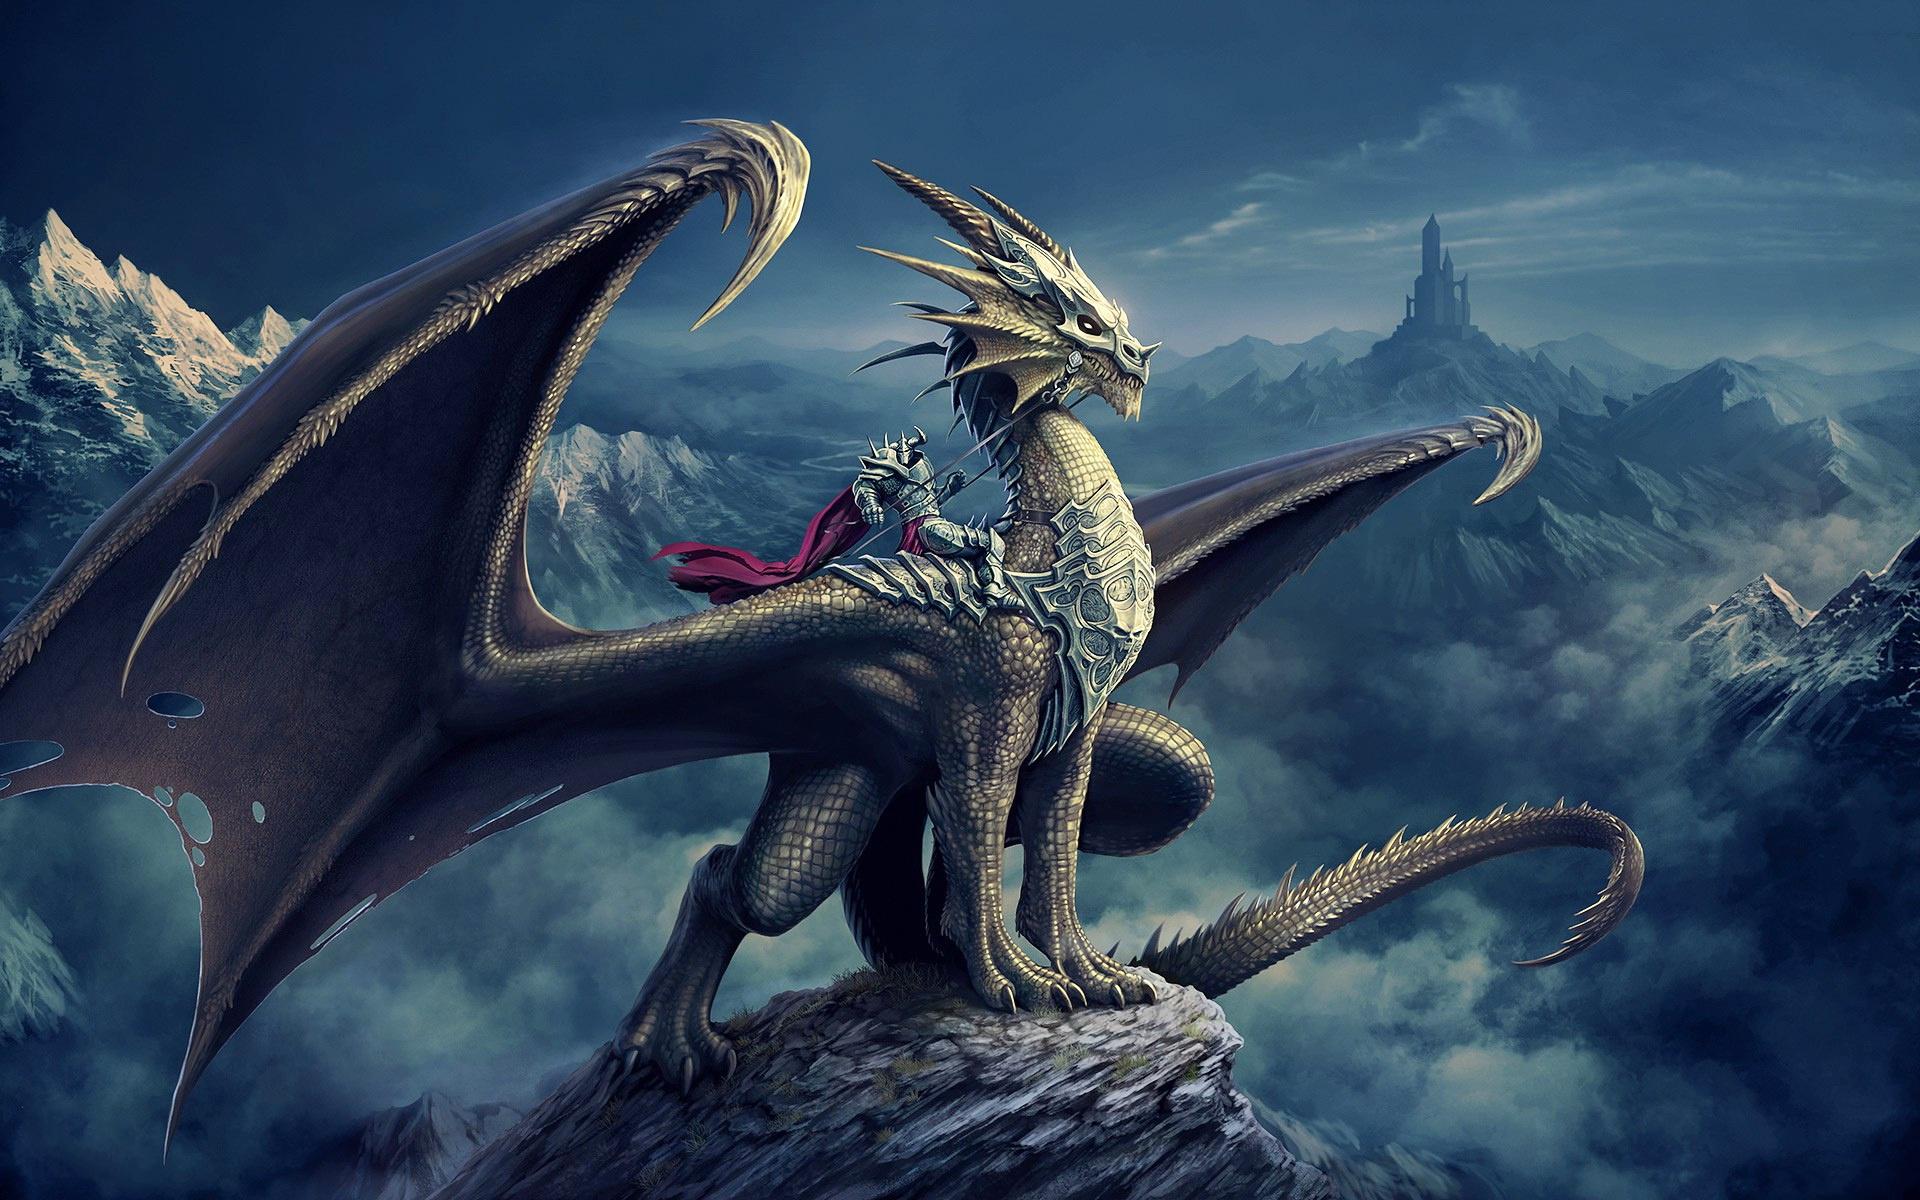 Fantasy Dragon Wallpaper High Resolution 5135 Wallpaper Cool 1920x1200